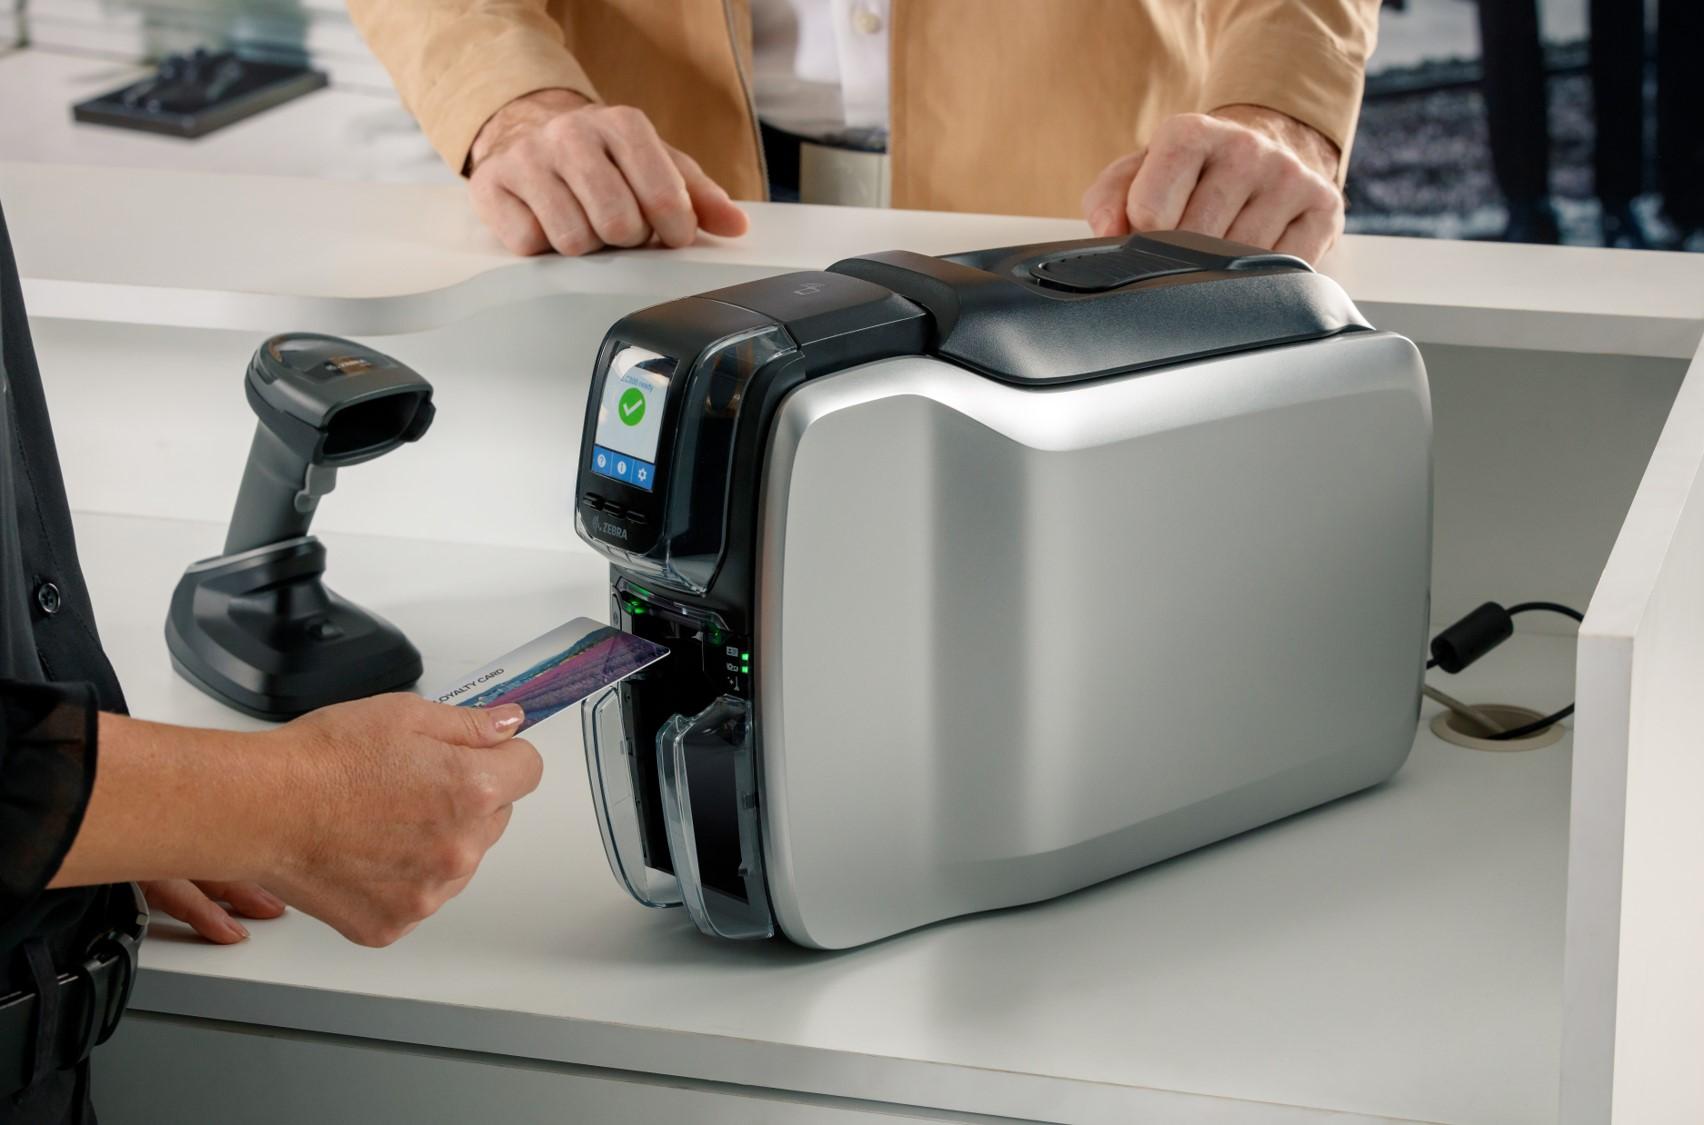 Imprimante mobile Zebra ZQ110 zz